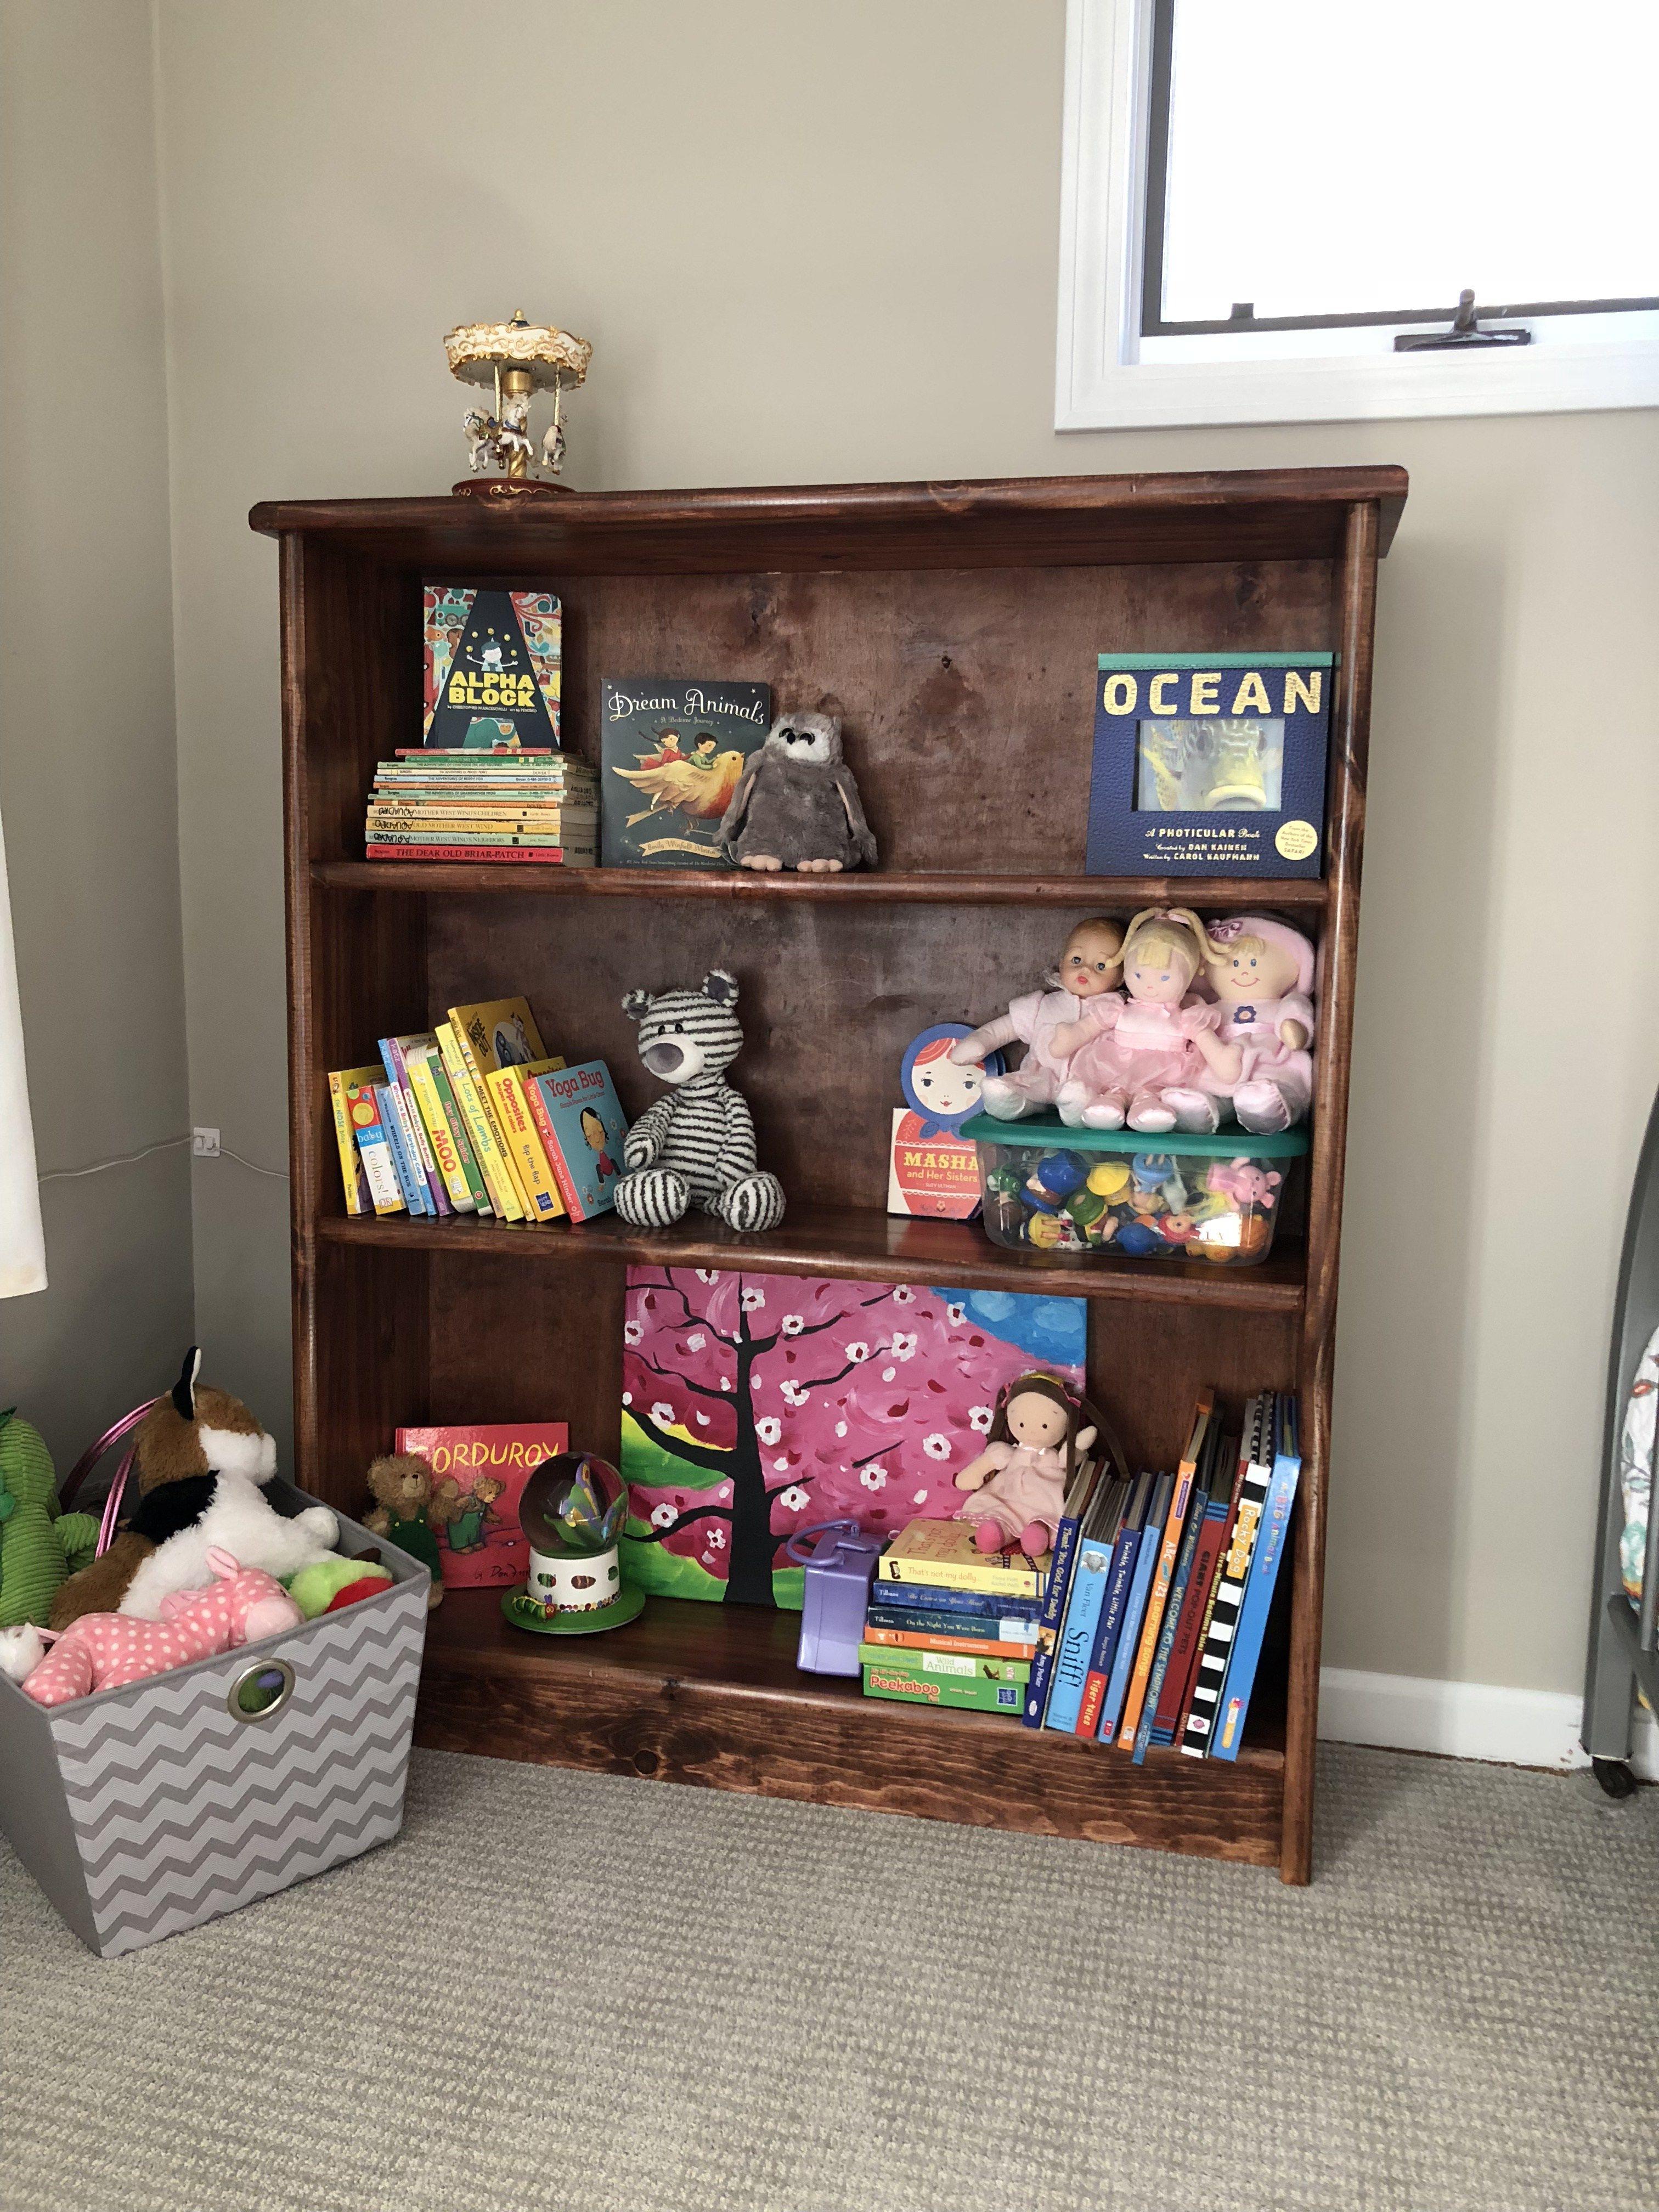 The simple bookshelf I built!